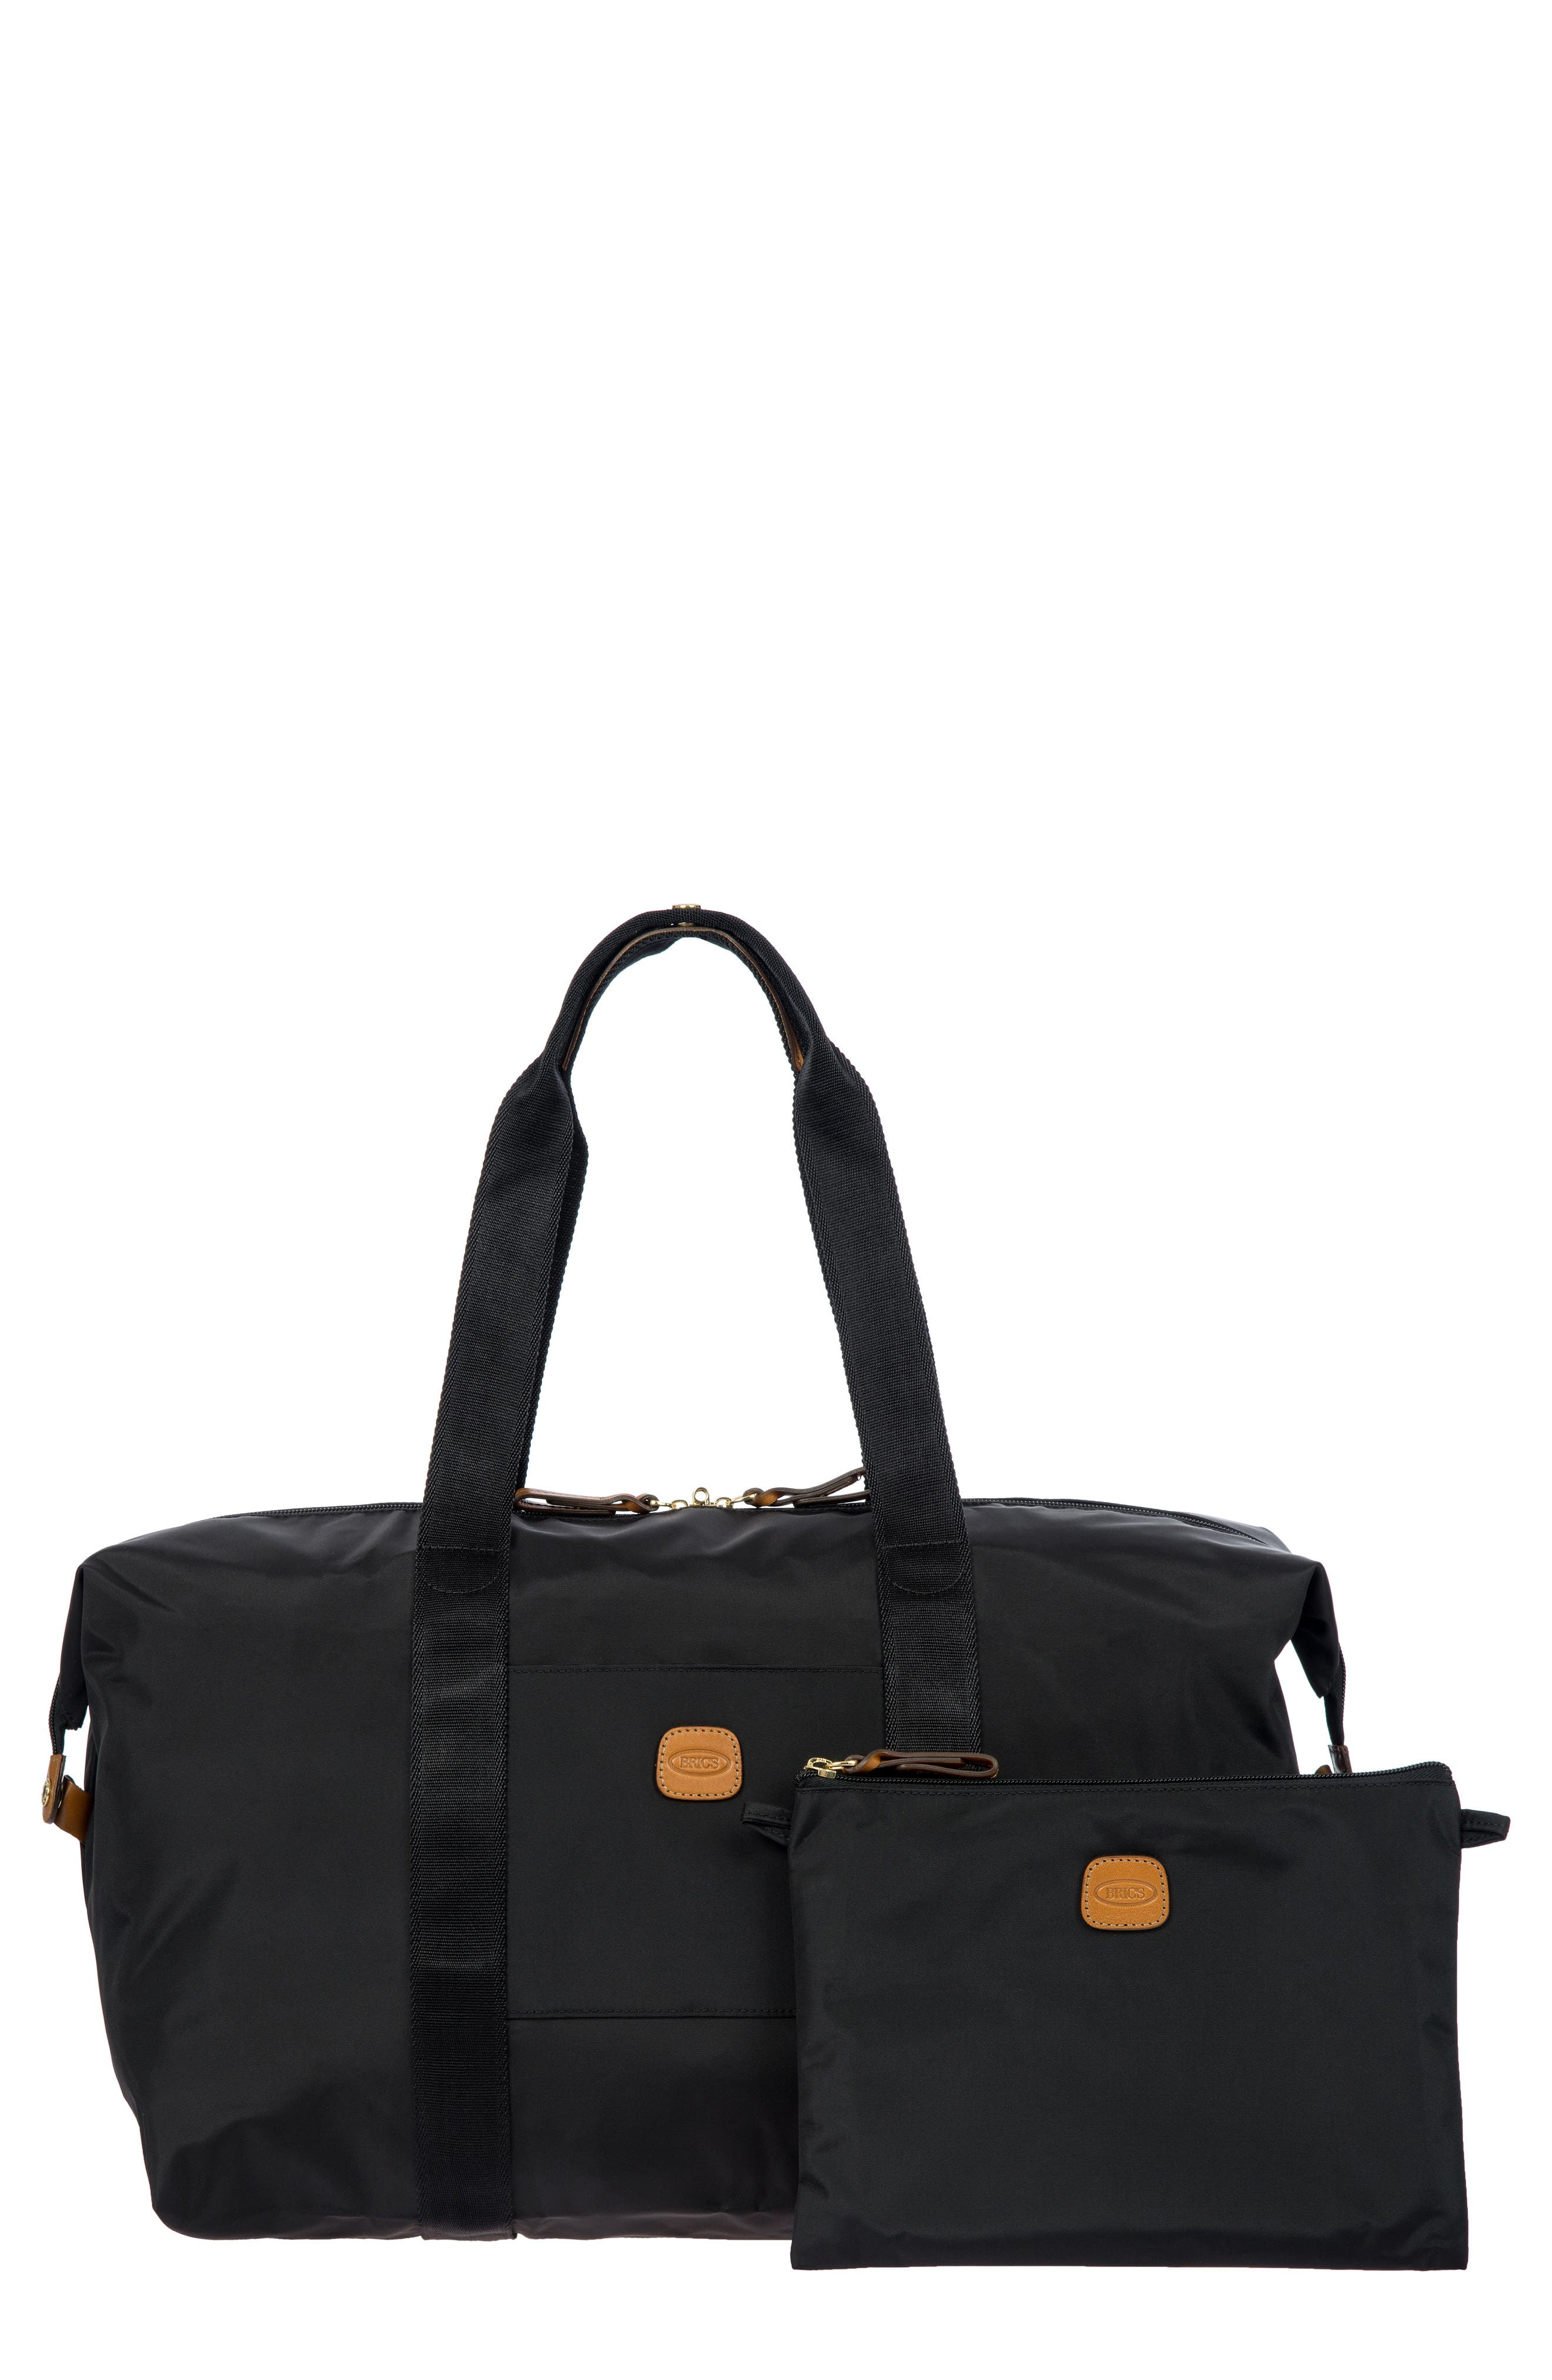 X-Bag 18-Inch Folding Duffel Bag,                             Main thumbnail 1, color,                             BLACK